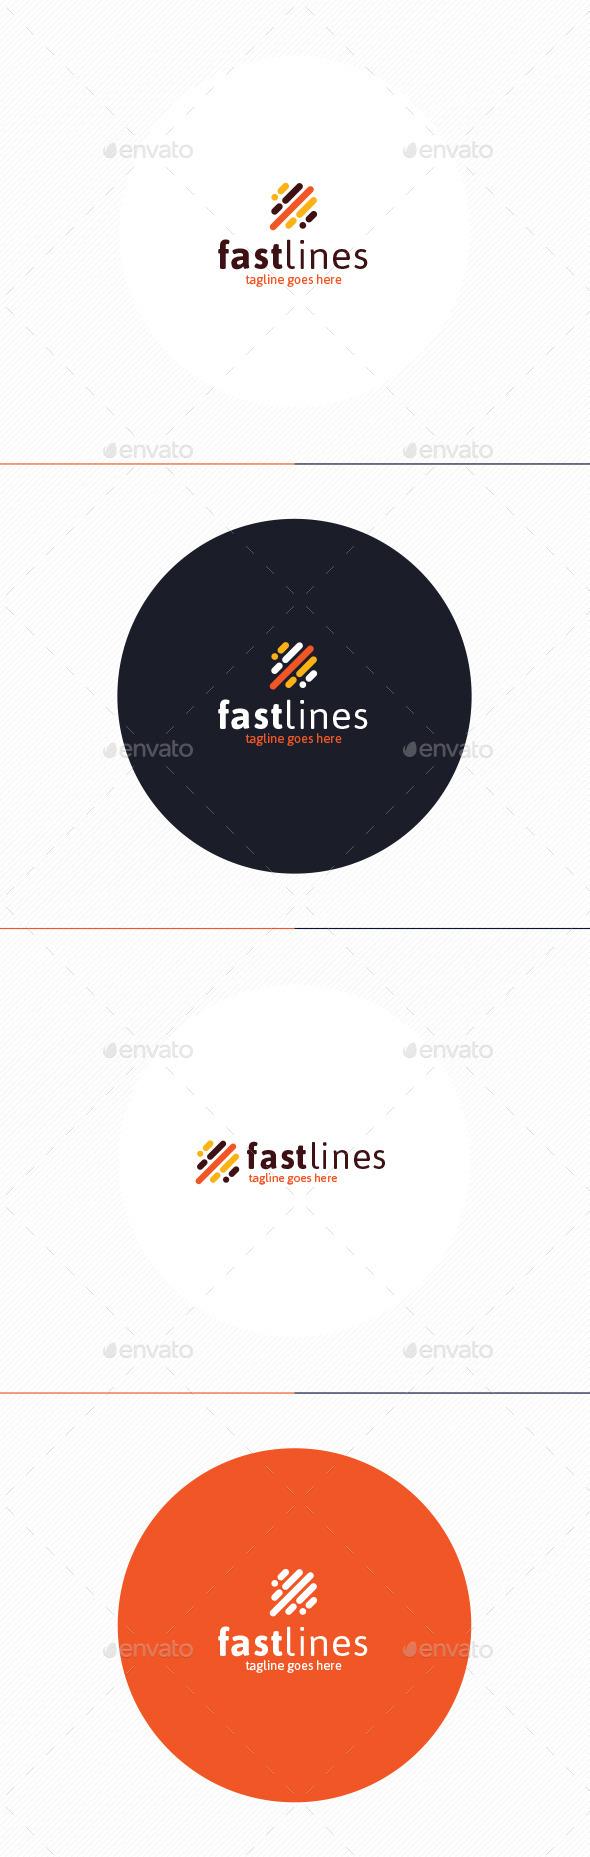 GraphicRiver Fast Lines Logo 10894880